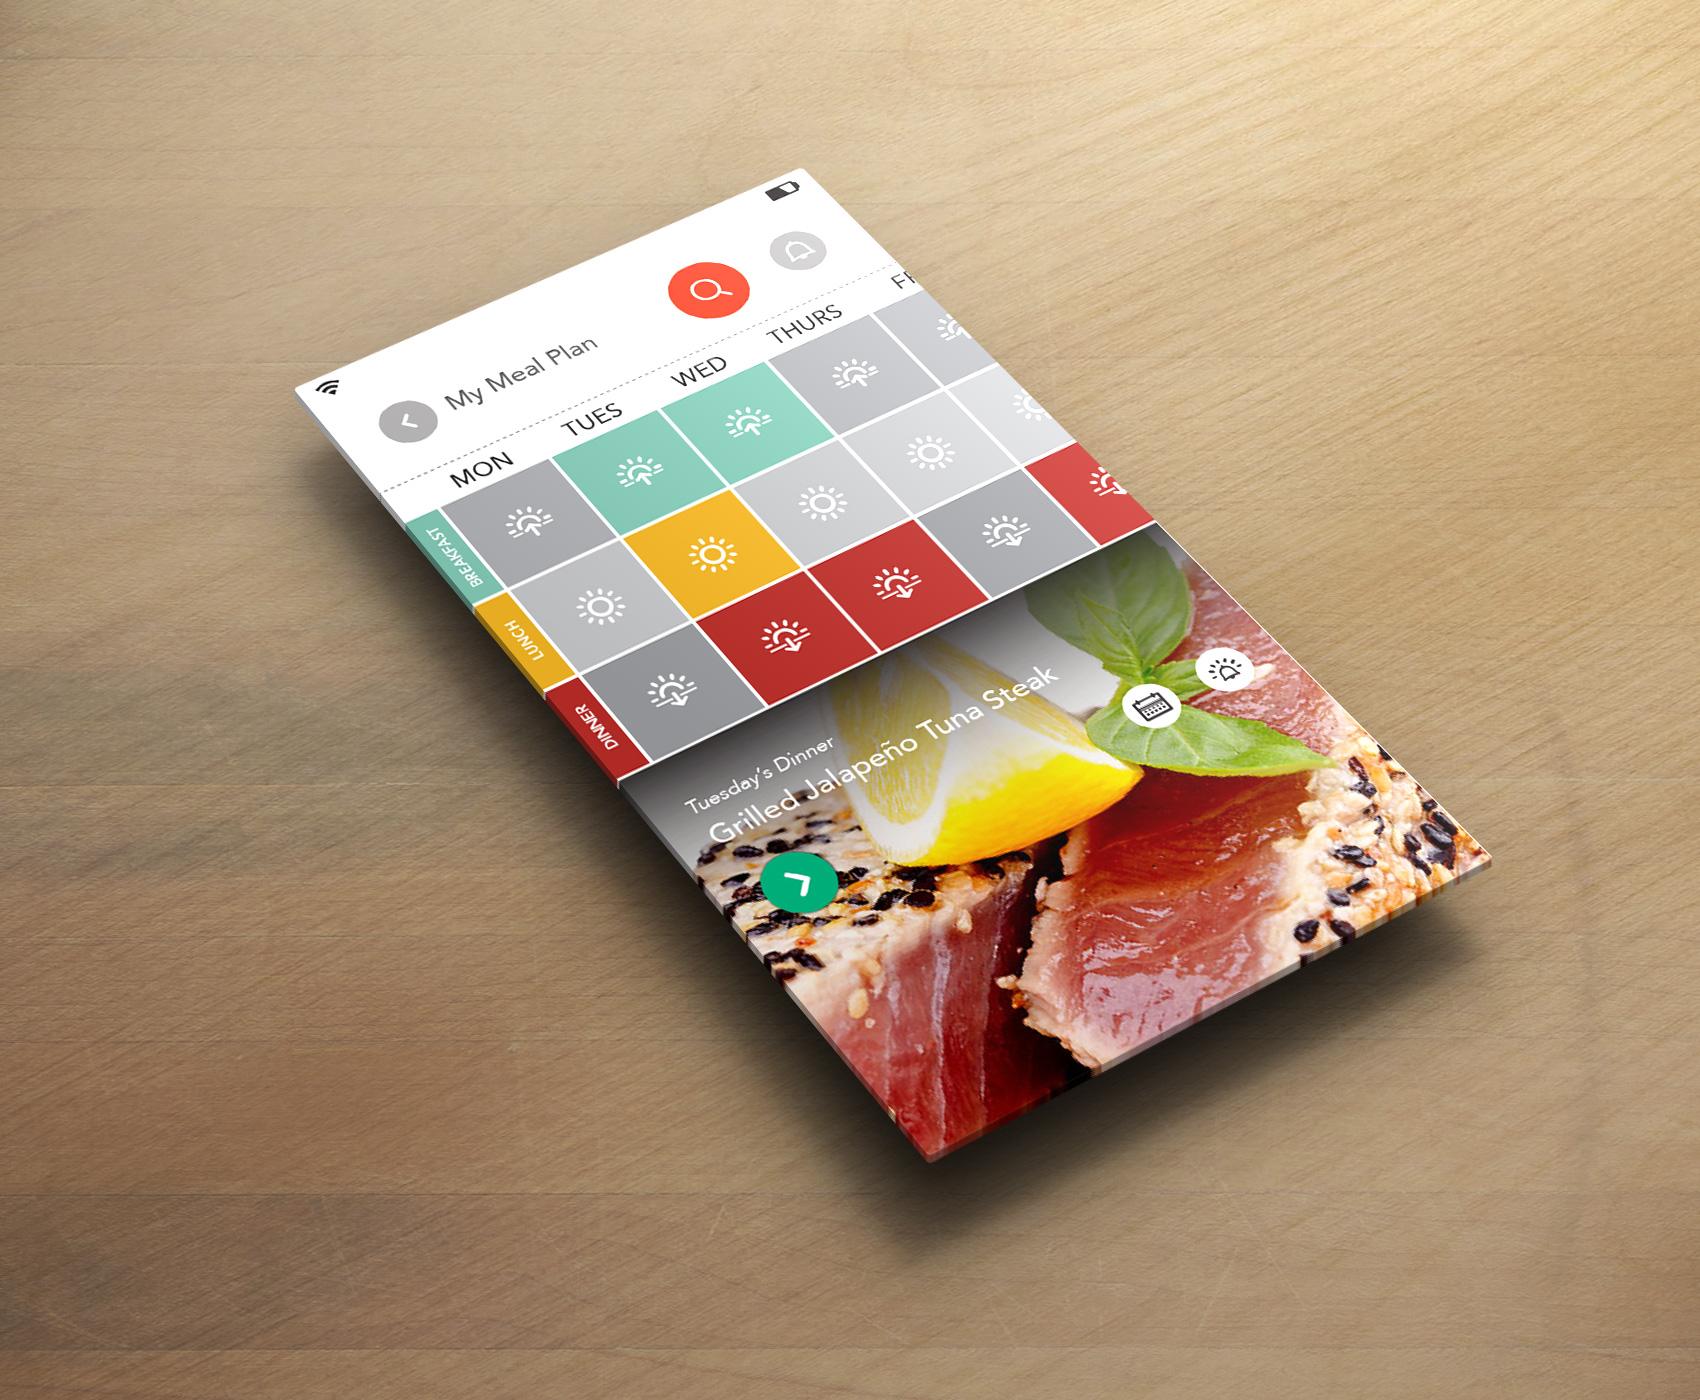 05_2014-05-29--My-Meal-Plan_CR_03-12.jpg